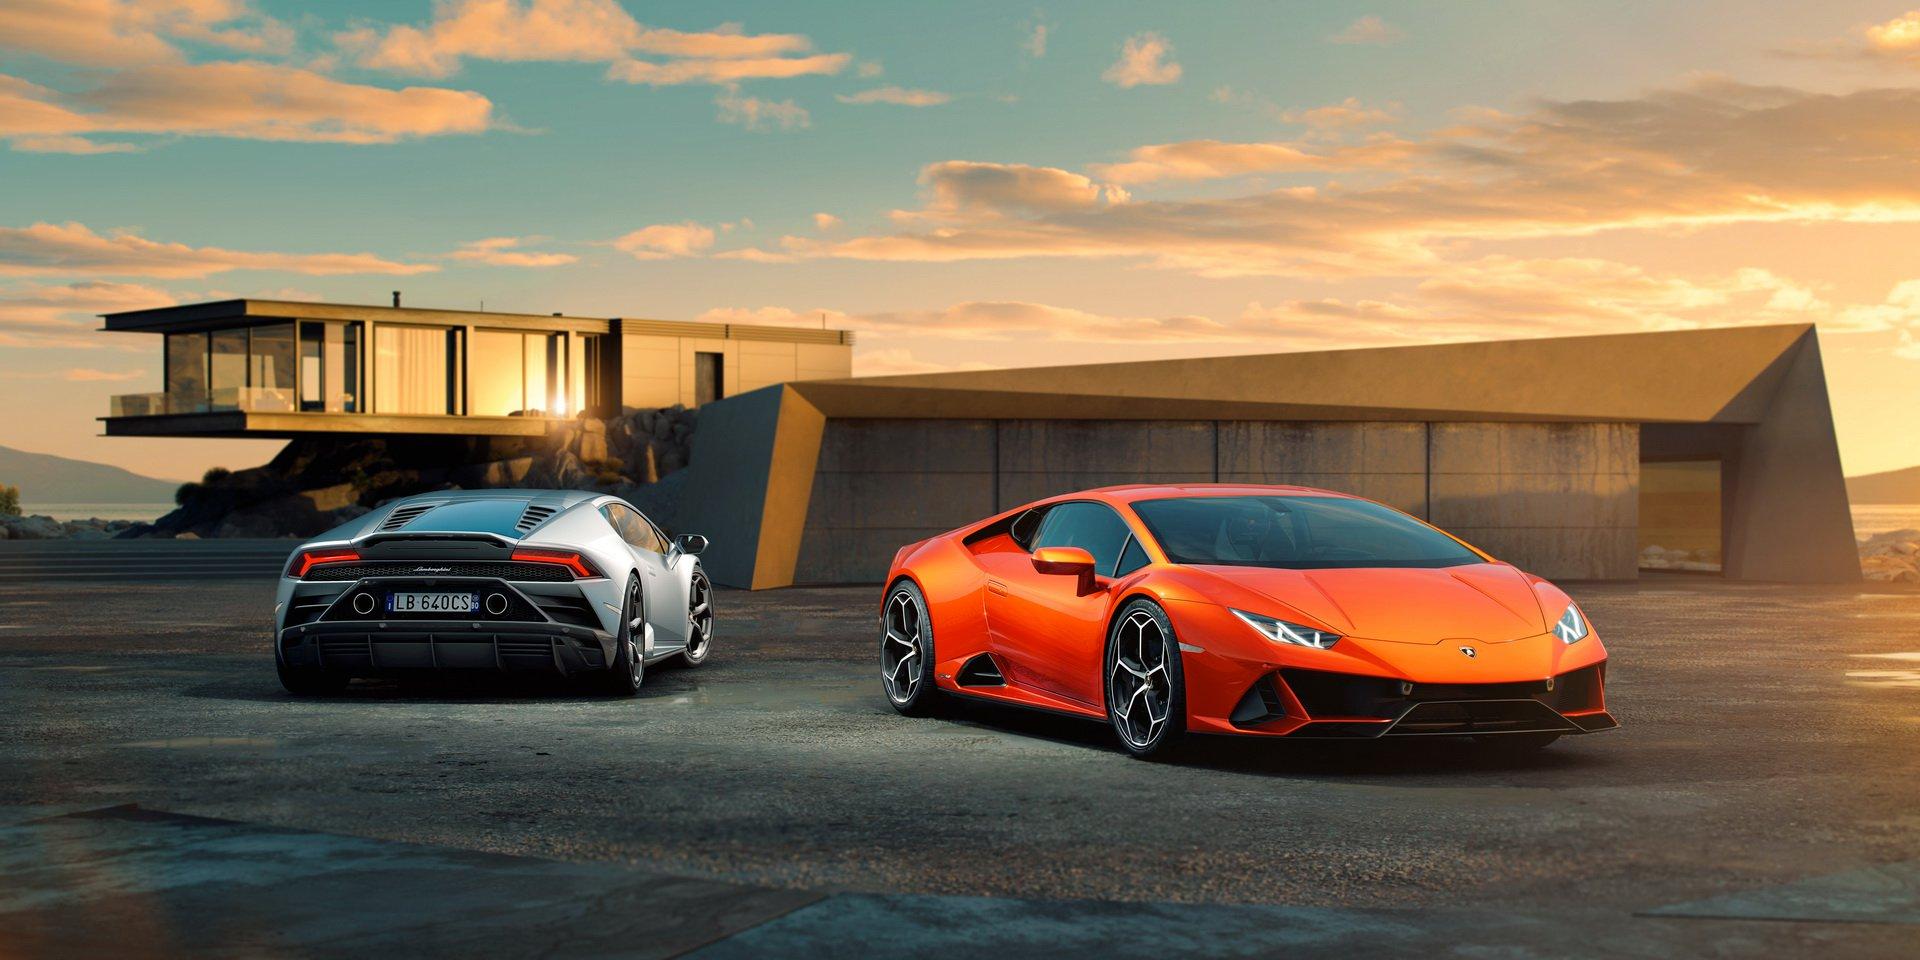 Las imágenes del Lamborghini Huracán EVO